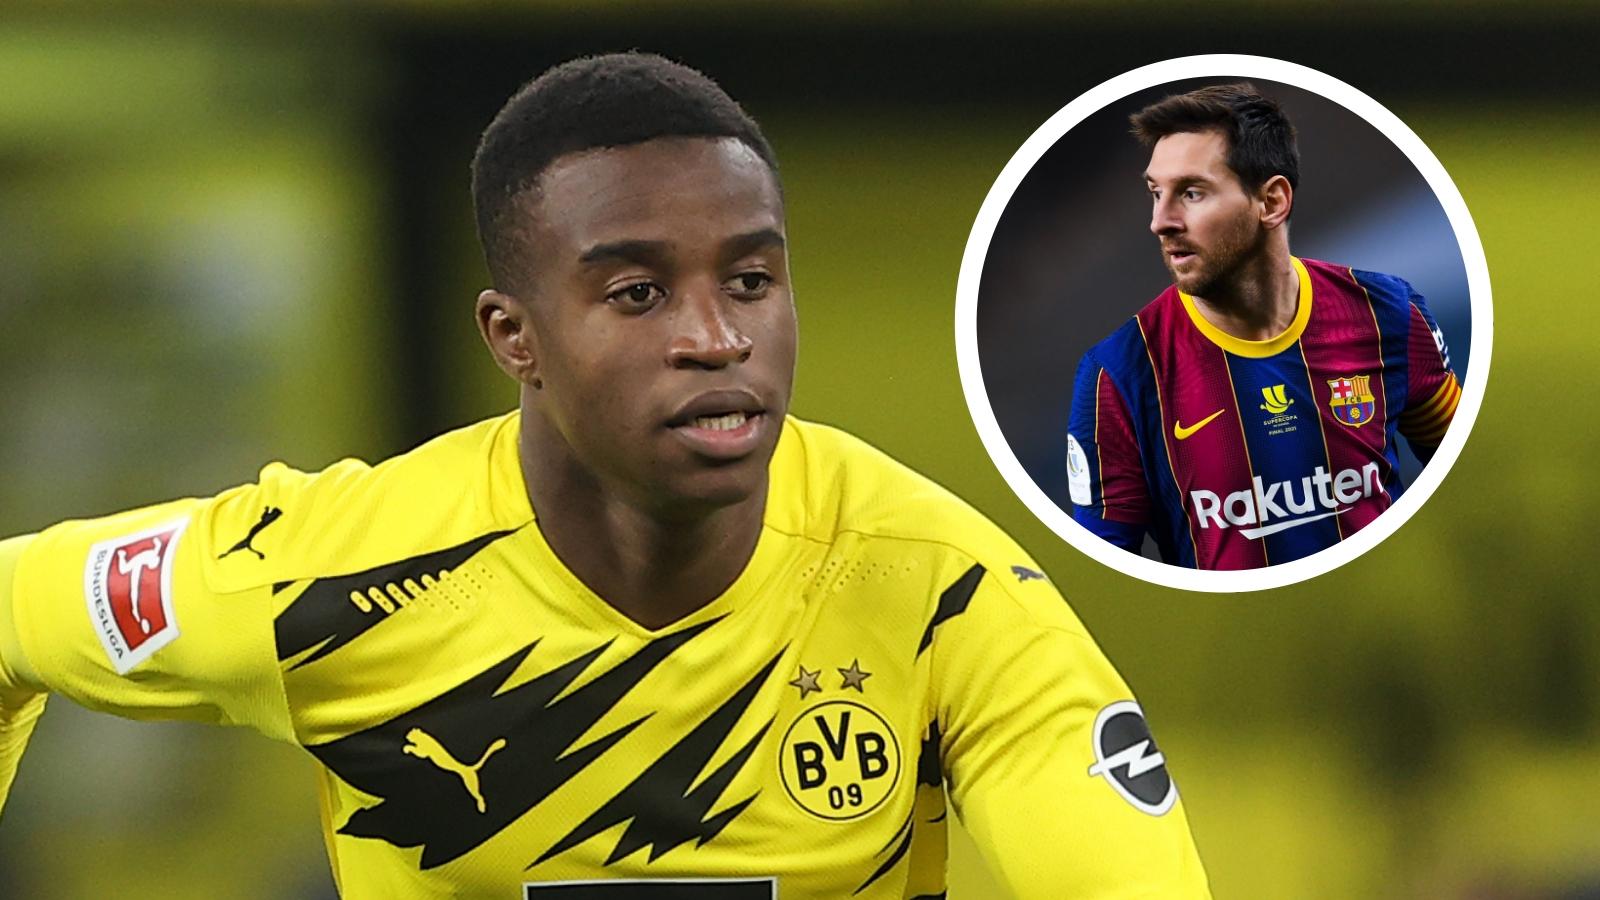 Dortmund wonderkid Moukoko idolised Messi as his brother backs him to ignore the hype